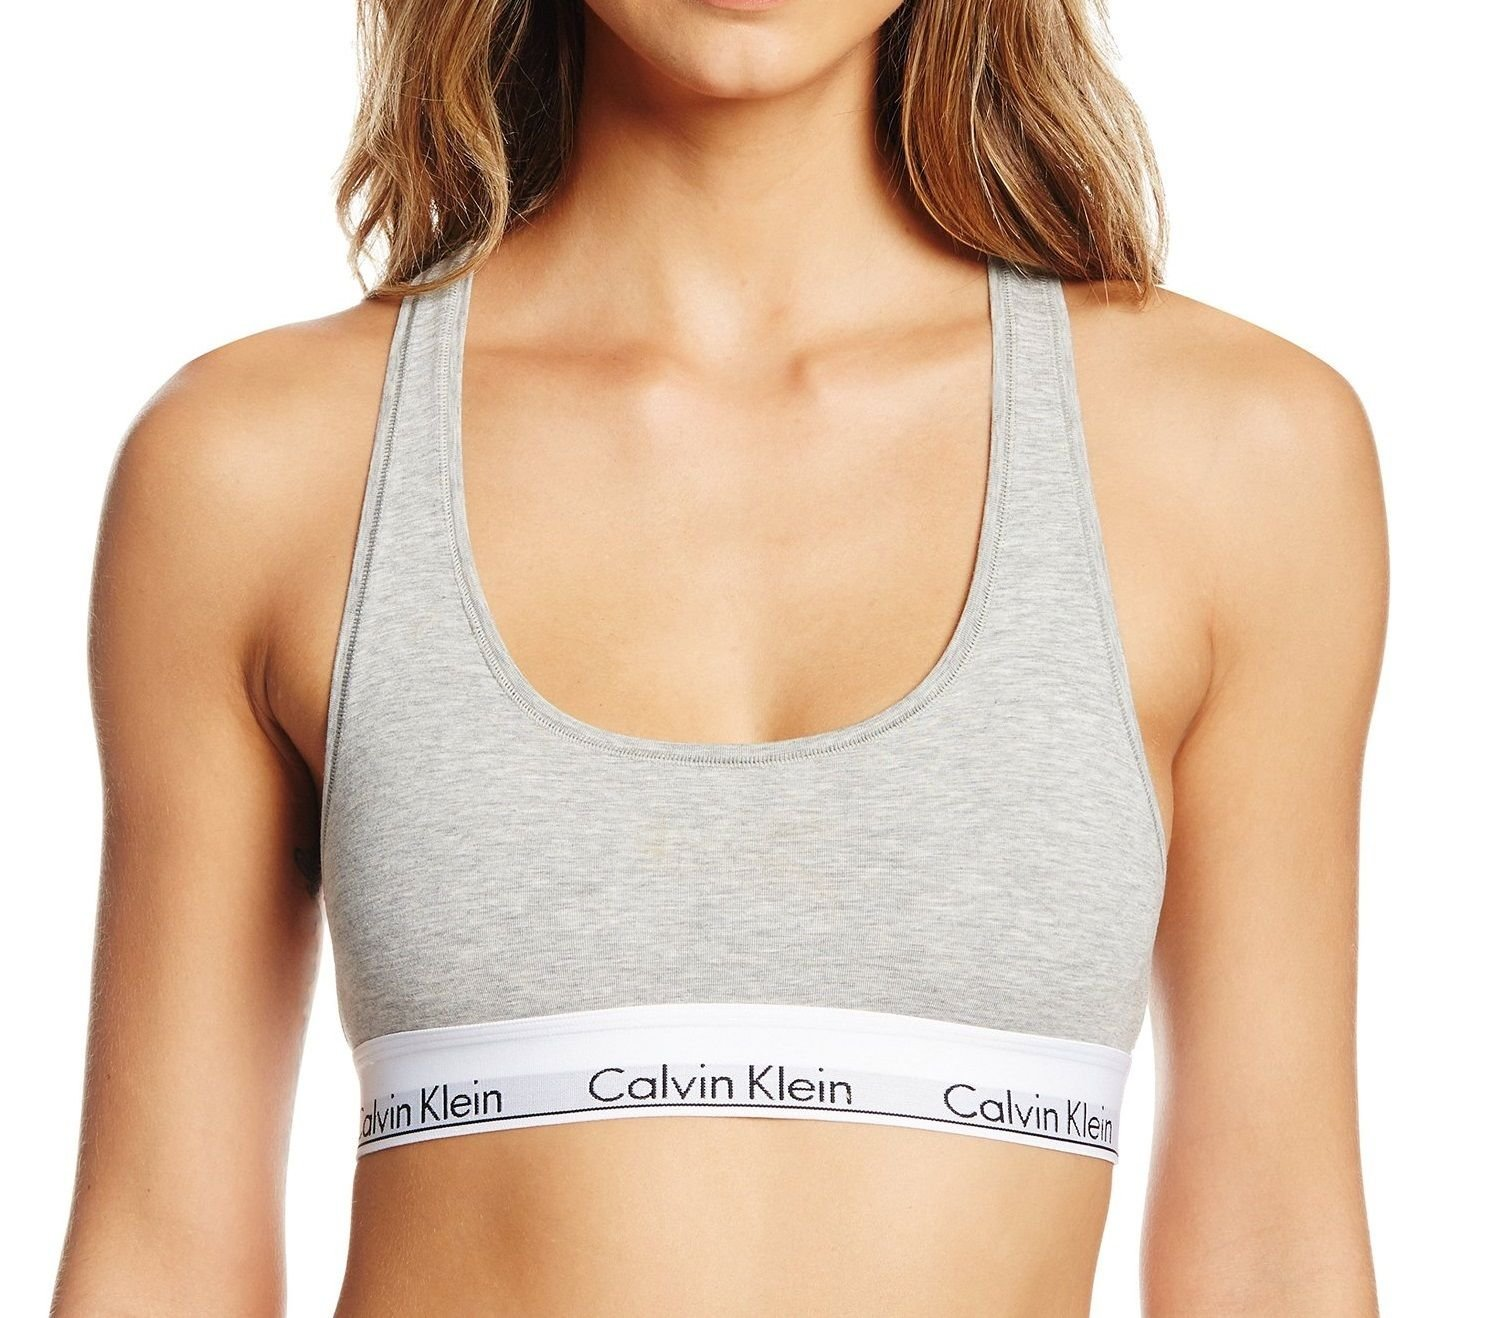 Calvin Klein Women`s Modern Cotton Bralette 1 Pack (Grey Heather(F3785X-020)/White/Black, Small)